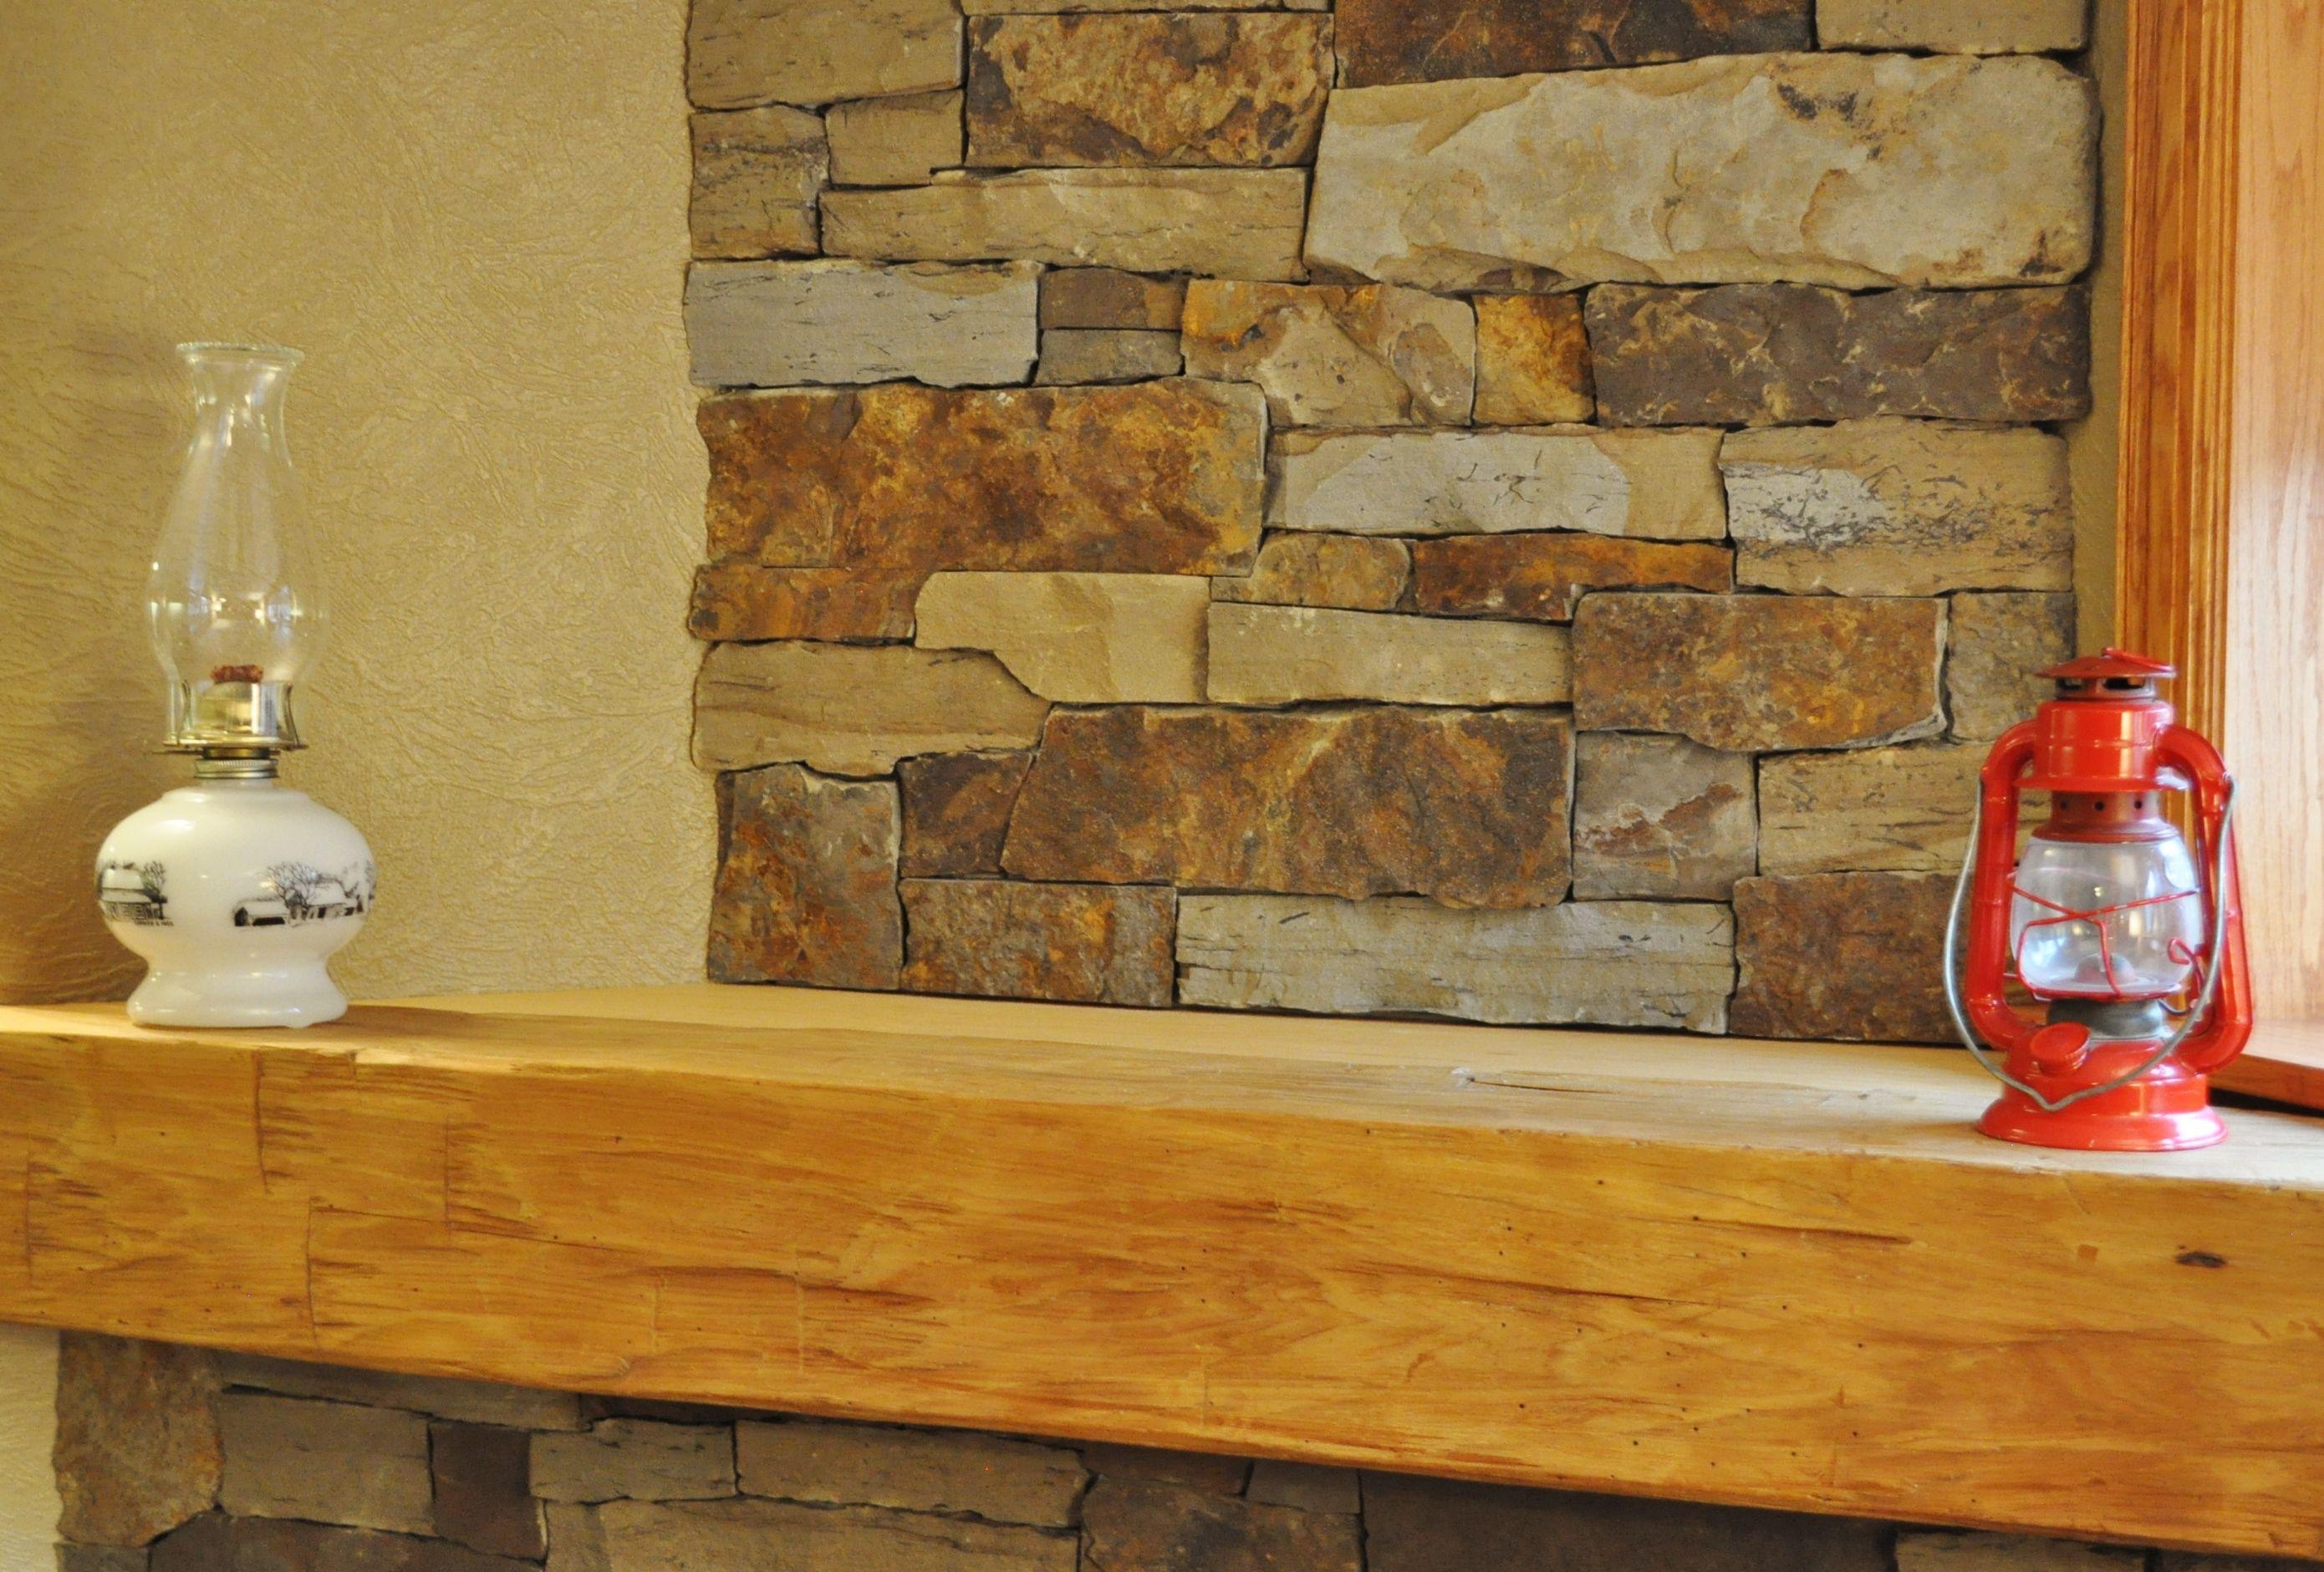 tiles veneer on stone on natural stone veneer fireplace how to build